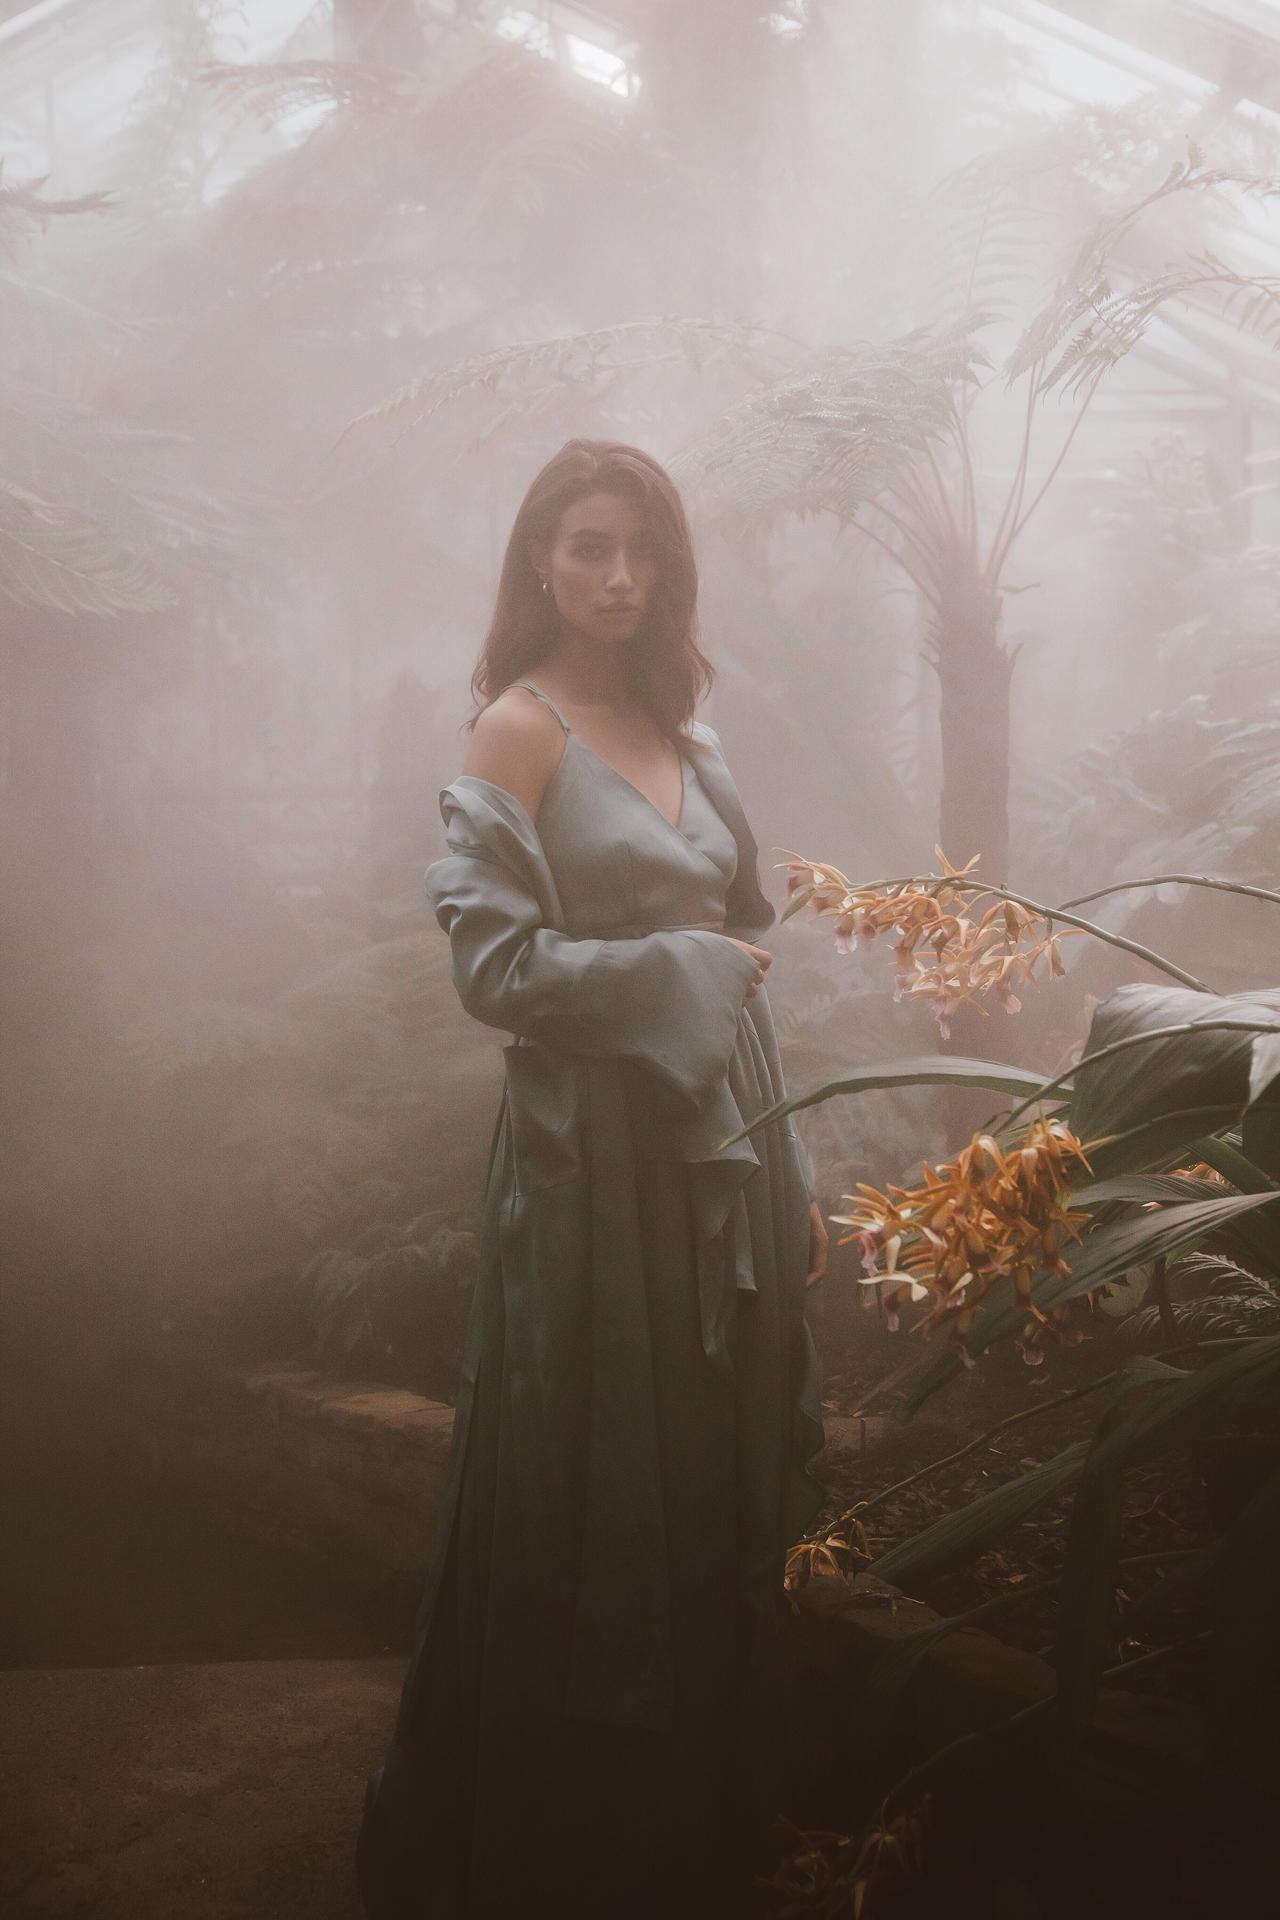 Elena  Hegenberg - conscious decision - Felix Schoeller Photoaward